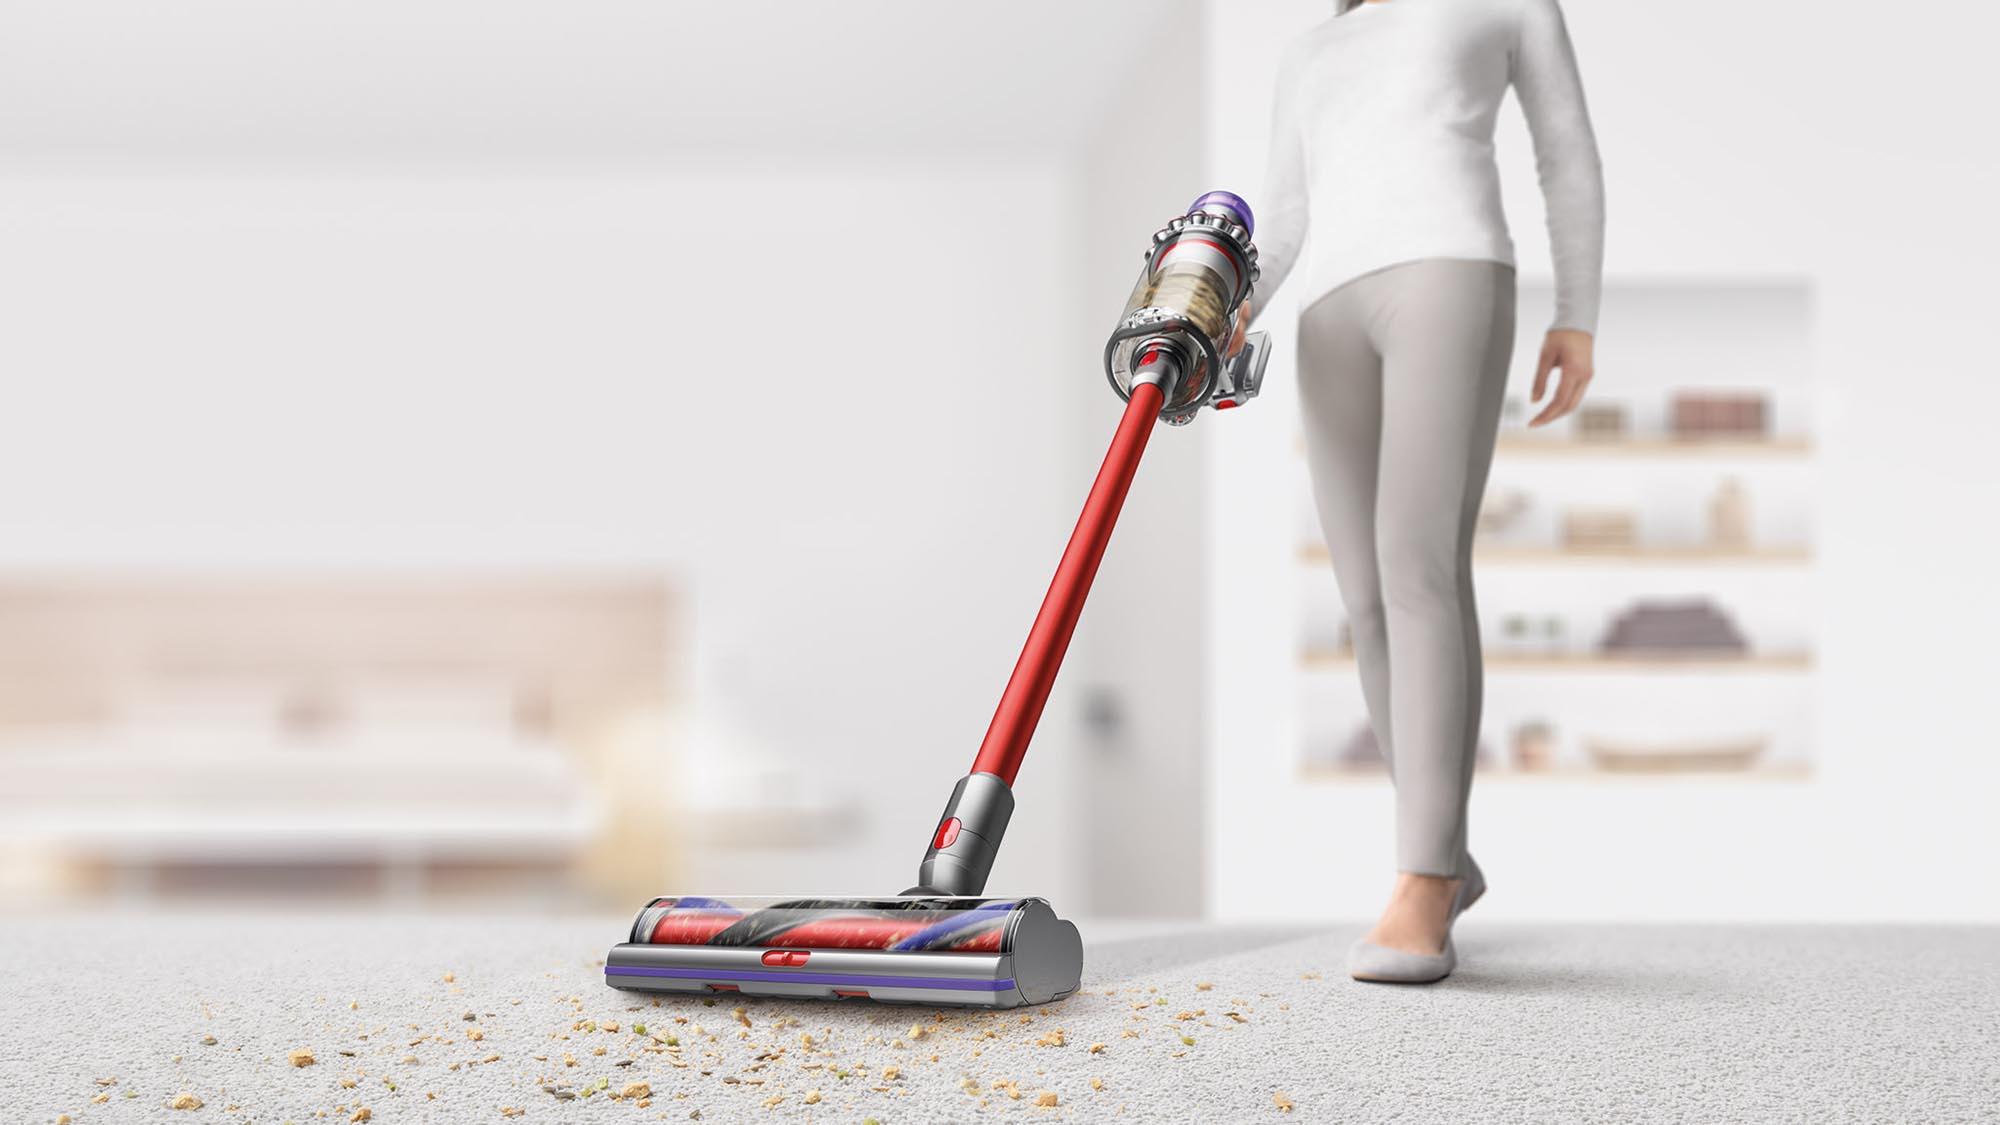 Dyson v11 Outsize Vacuum